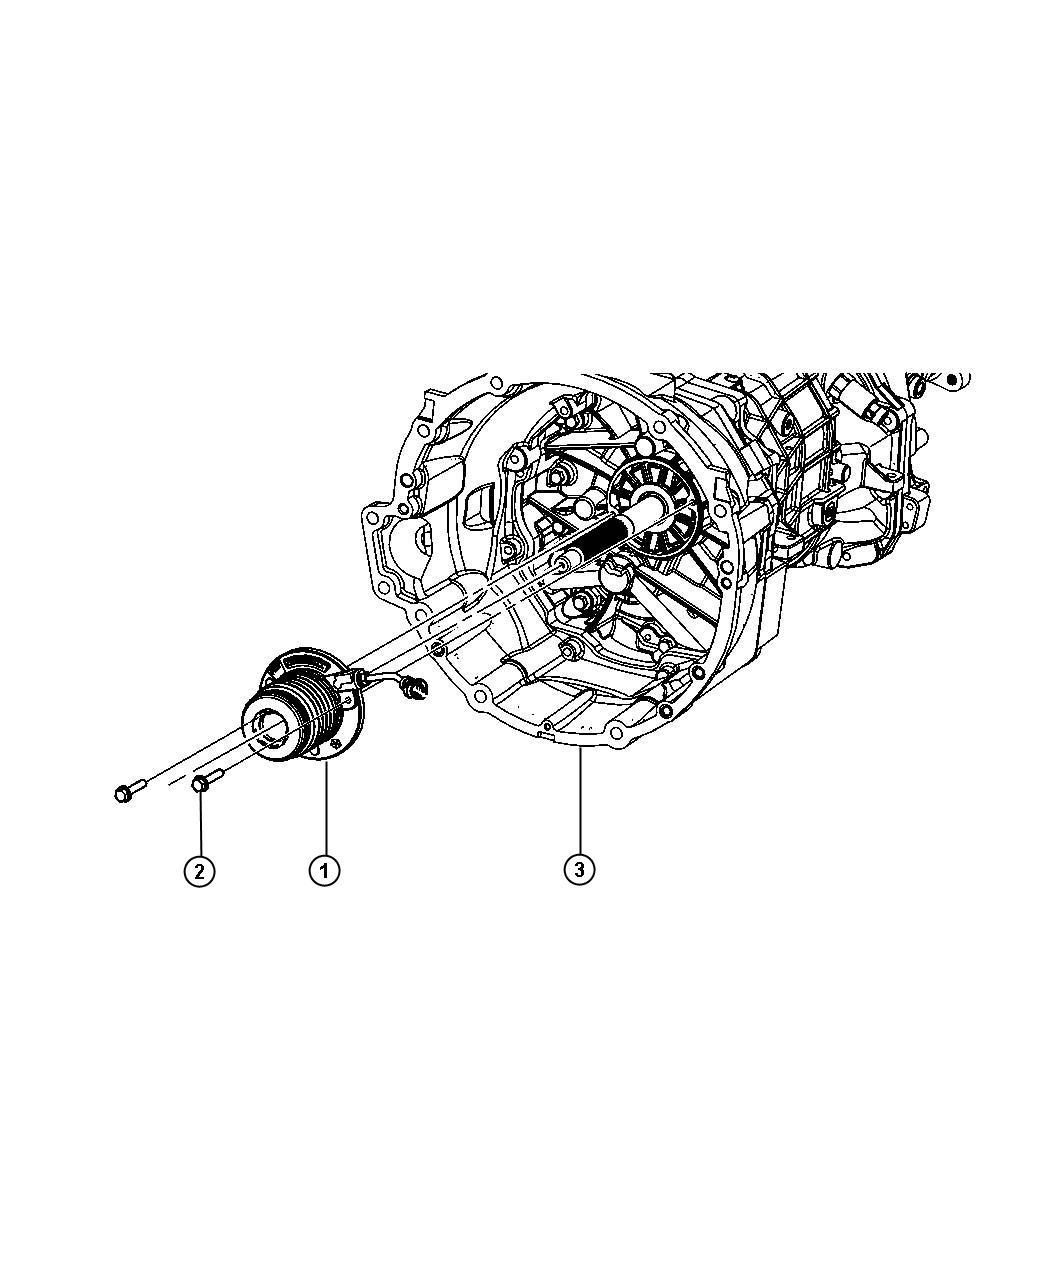 Dodge Actuator Assembly Clutch Concentric Slave